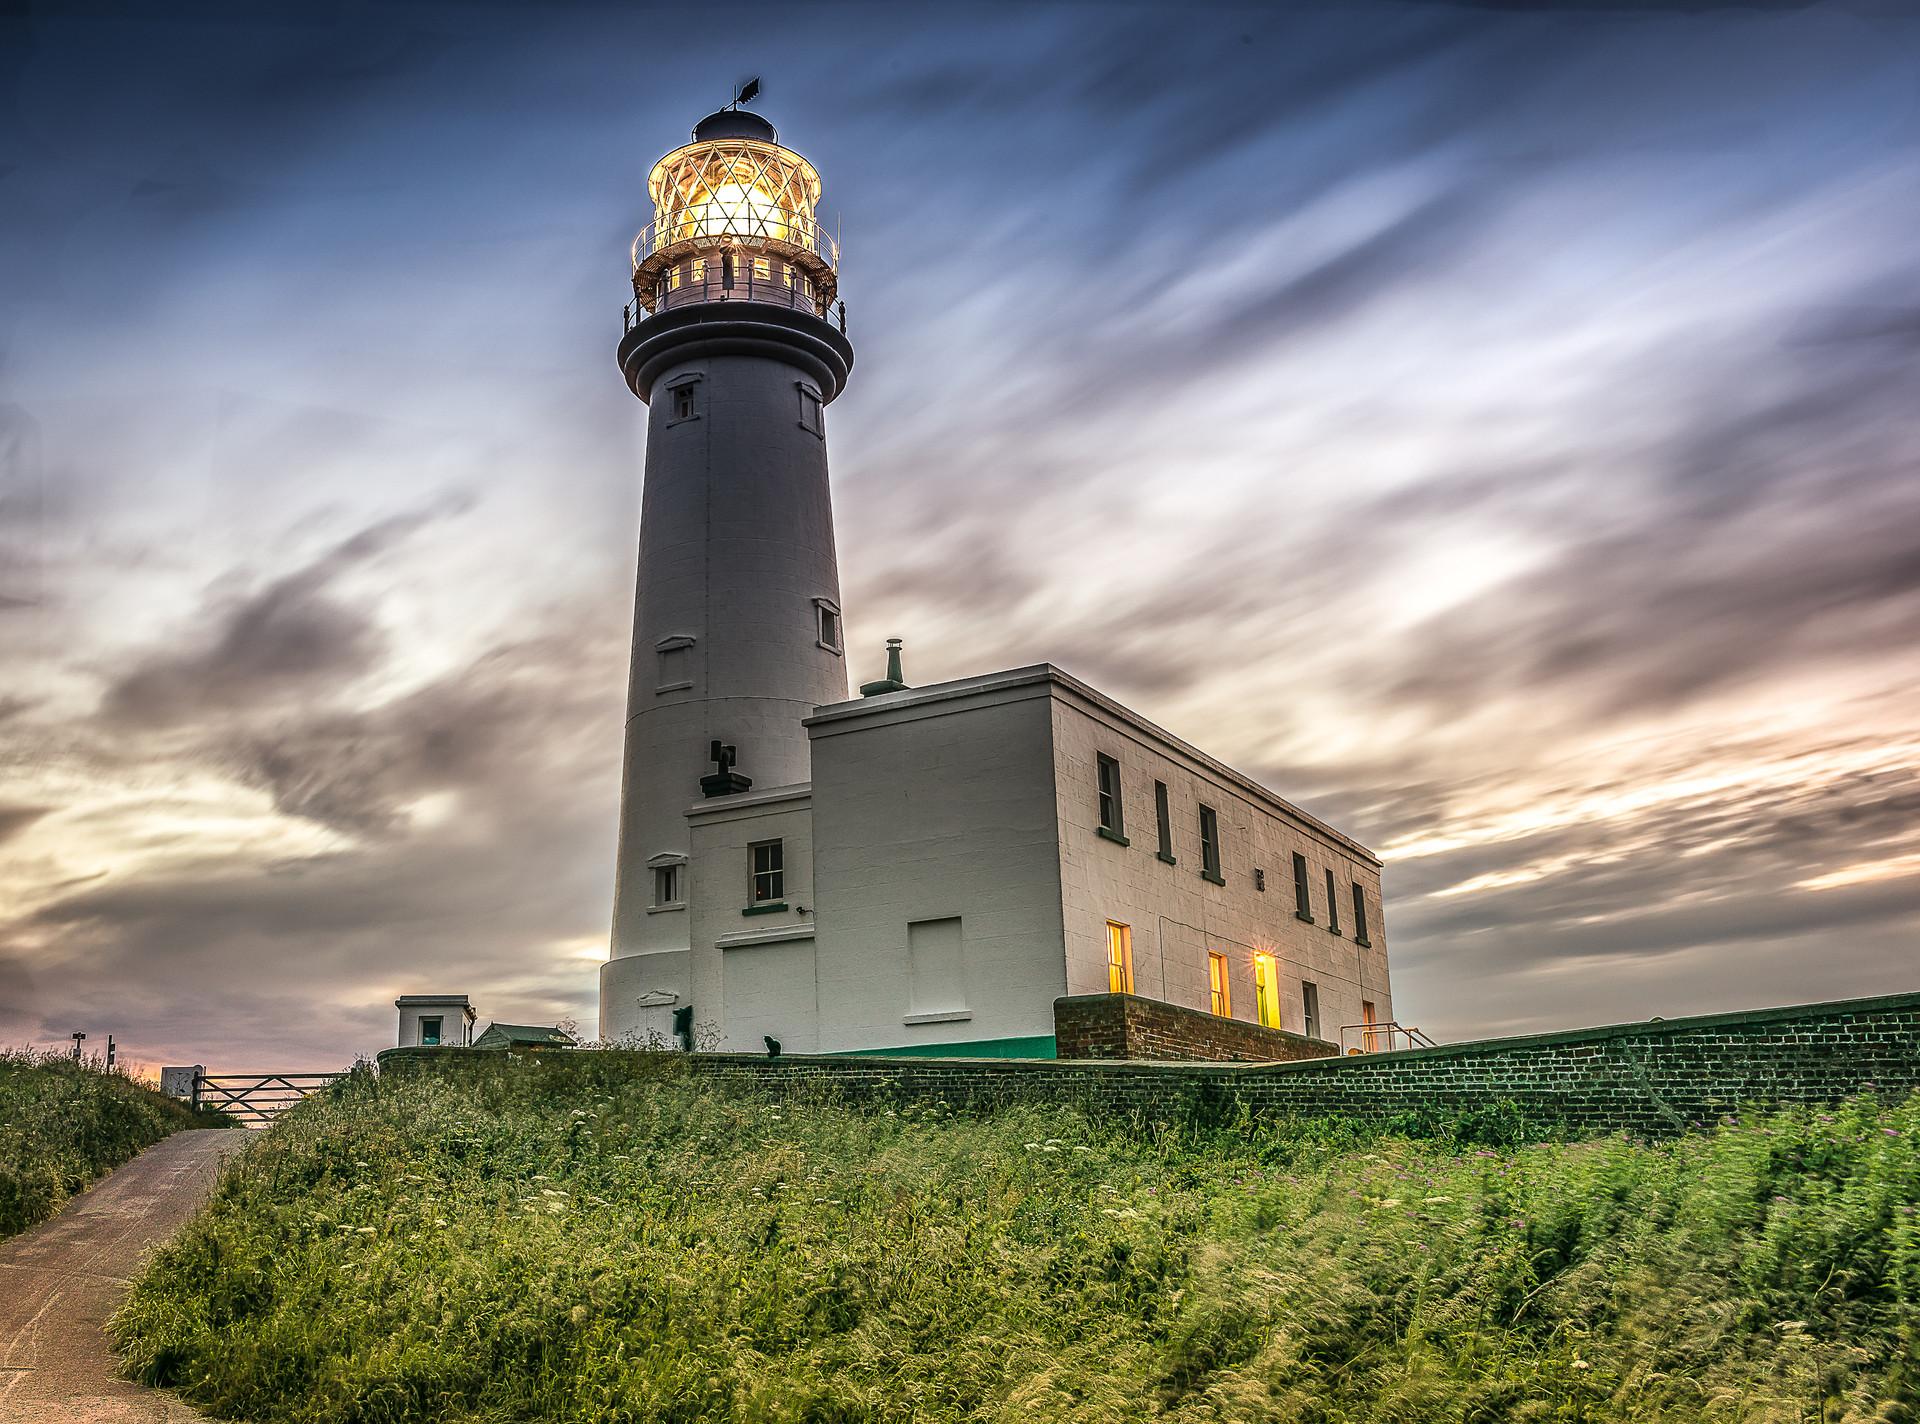 Flamborough Lighthouse